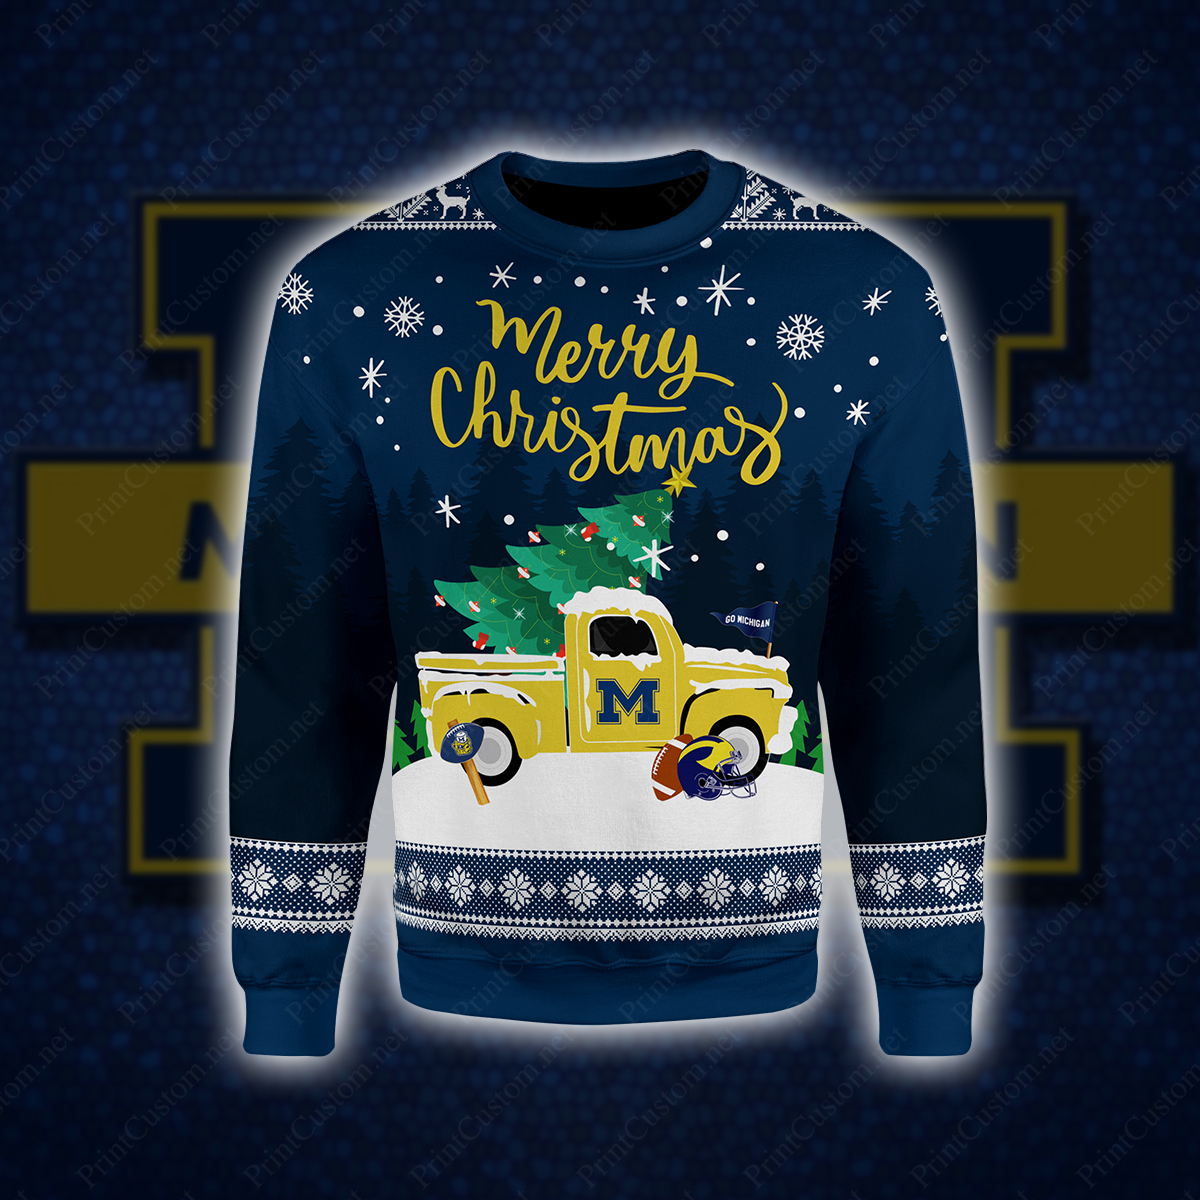 Michigan wolverines merry christmas full printing shirt 1